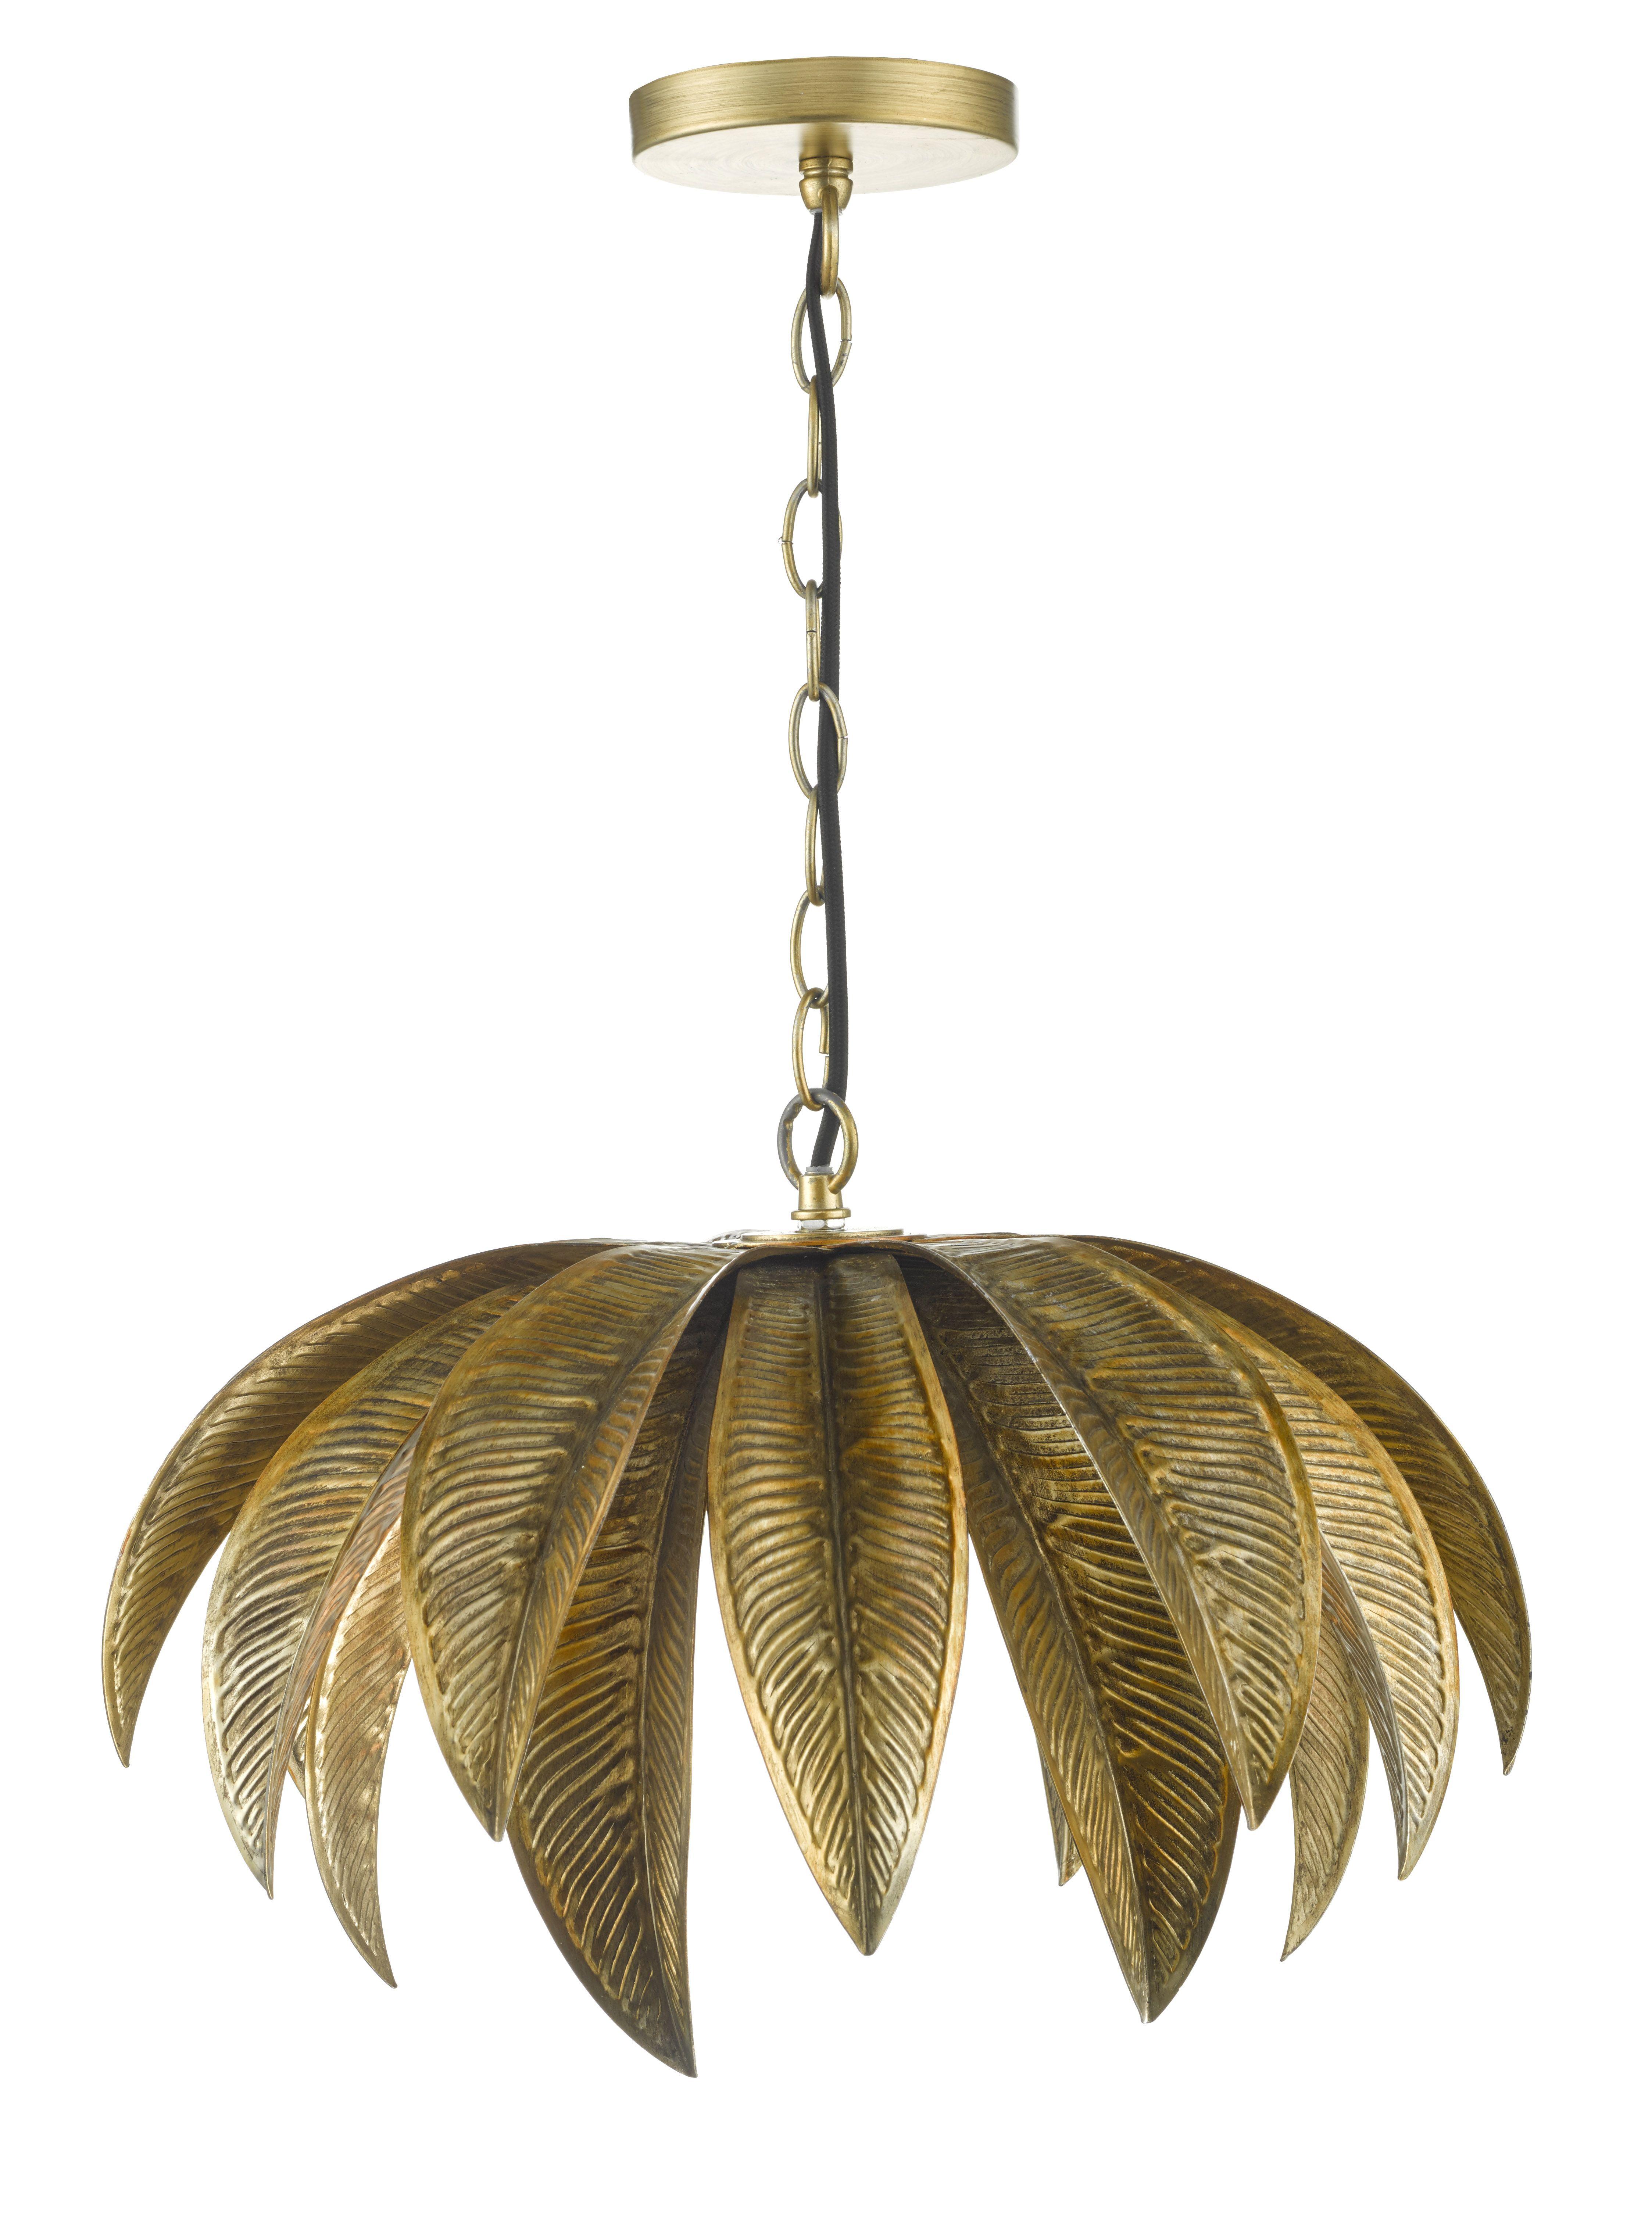 Home Collection - Gold Palm Leaf u0027Carau0027 Pendant Ceiling Light  sc 1 st  Pinterest & Cara Leaf Pendant #lightingideas #industrialinterior ... azcodes.com